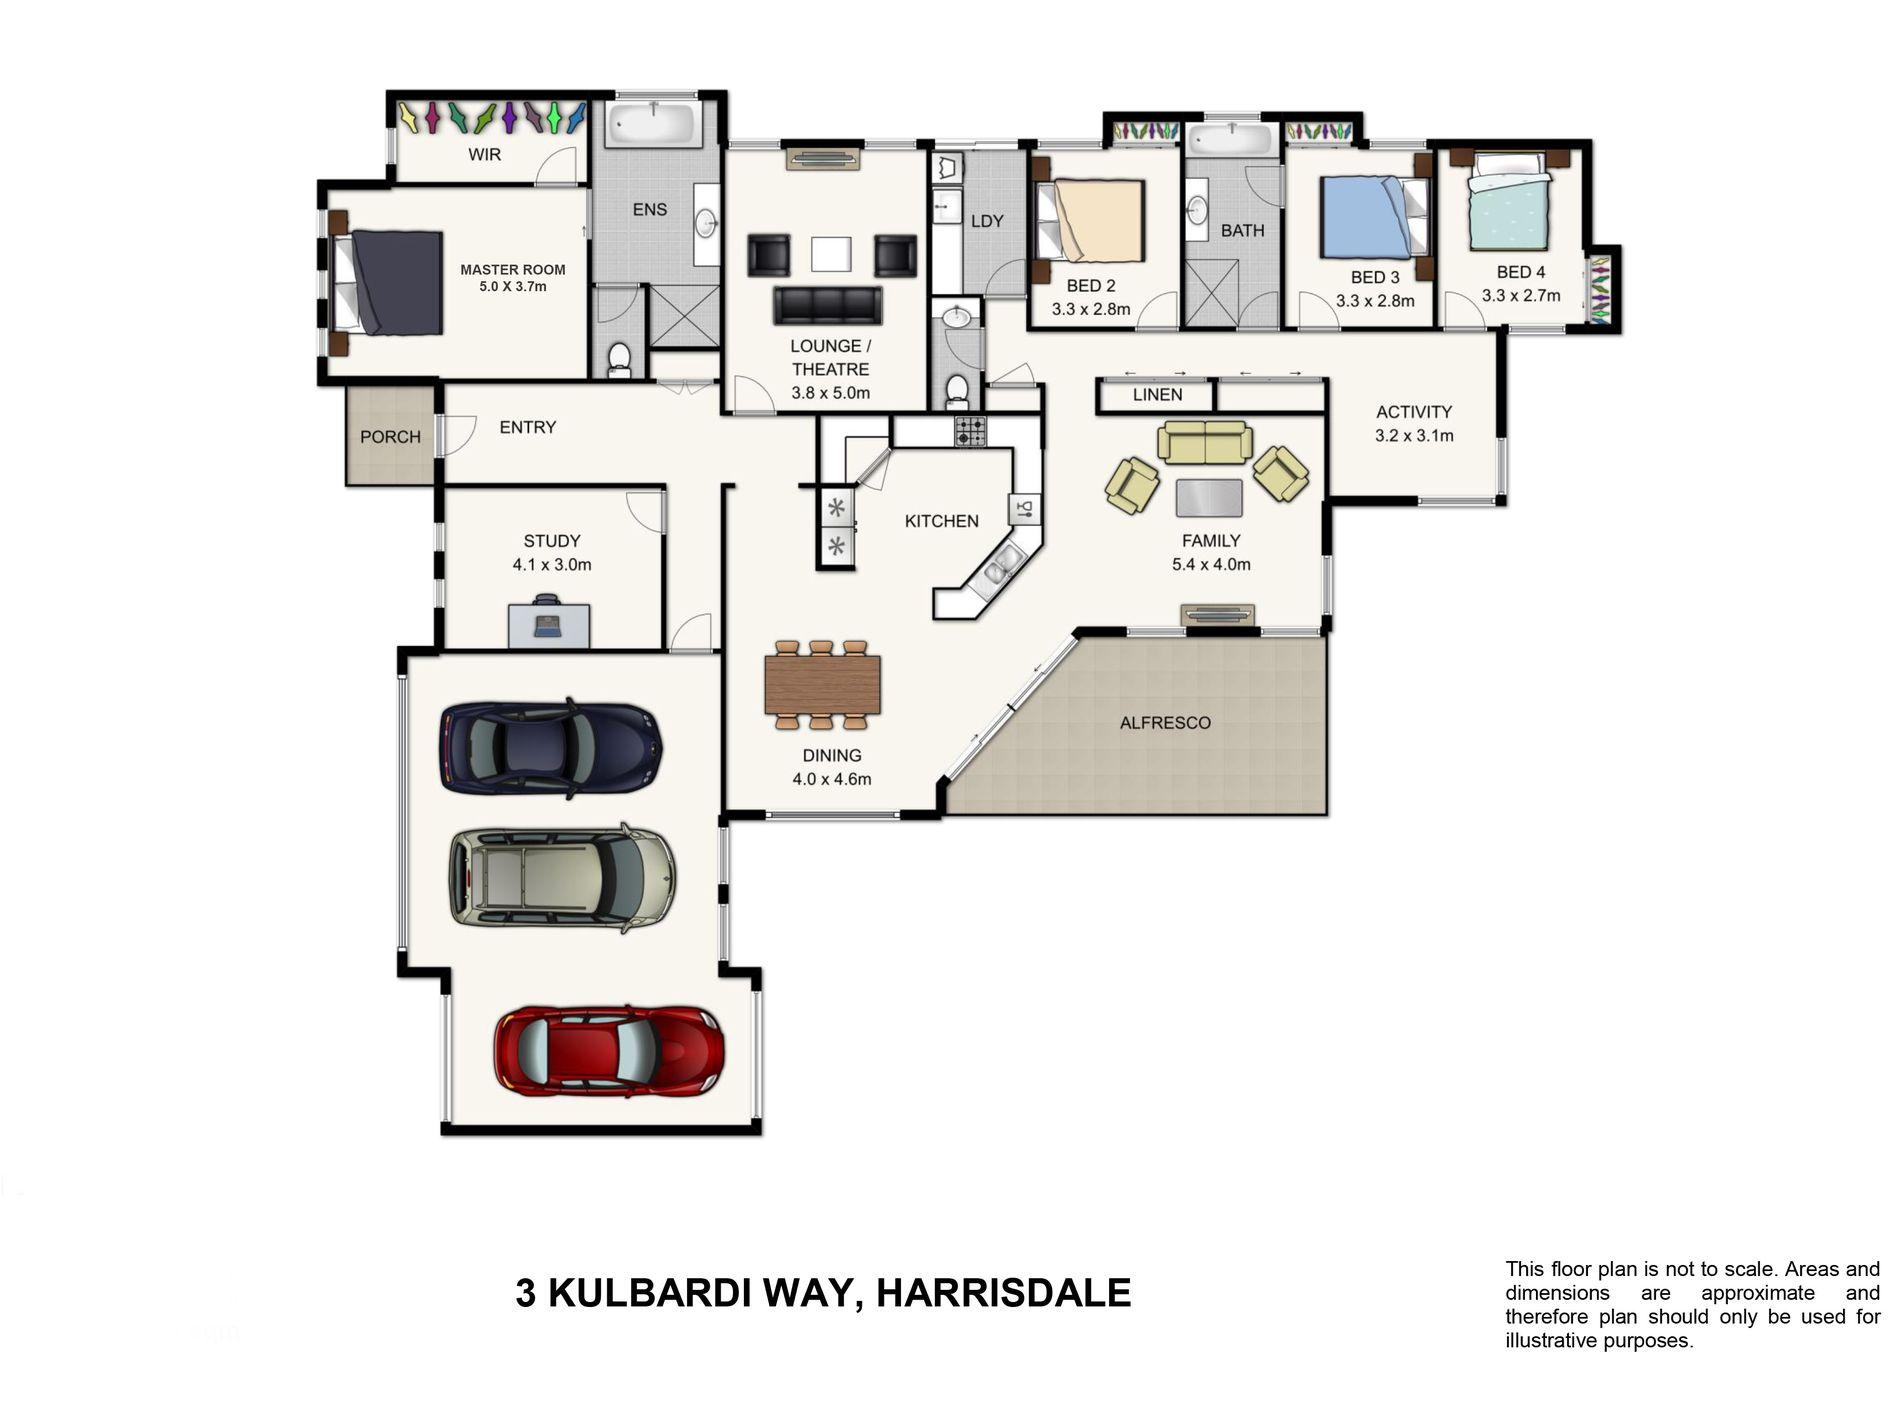 3 Kulbardi Way, Harrisdale